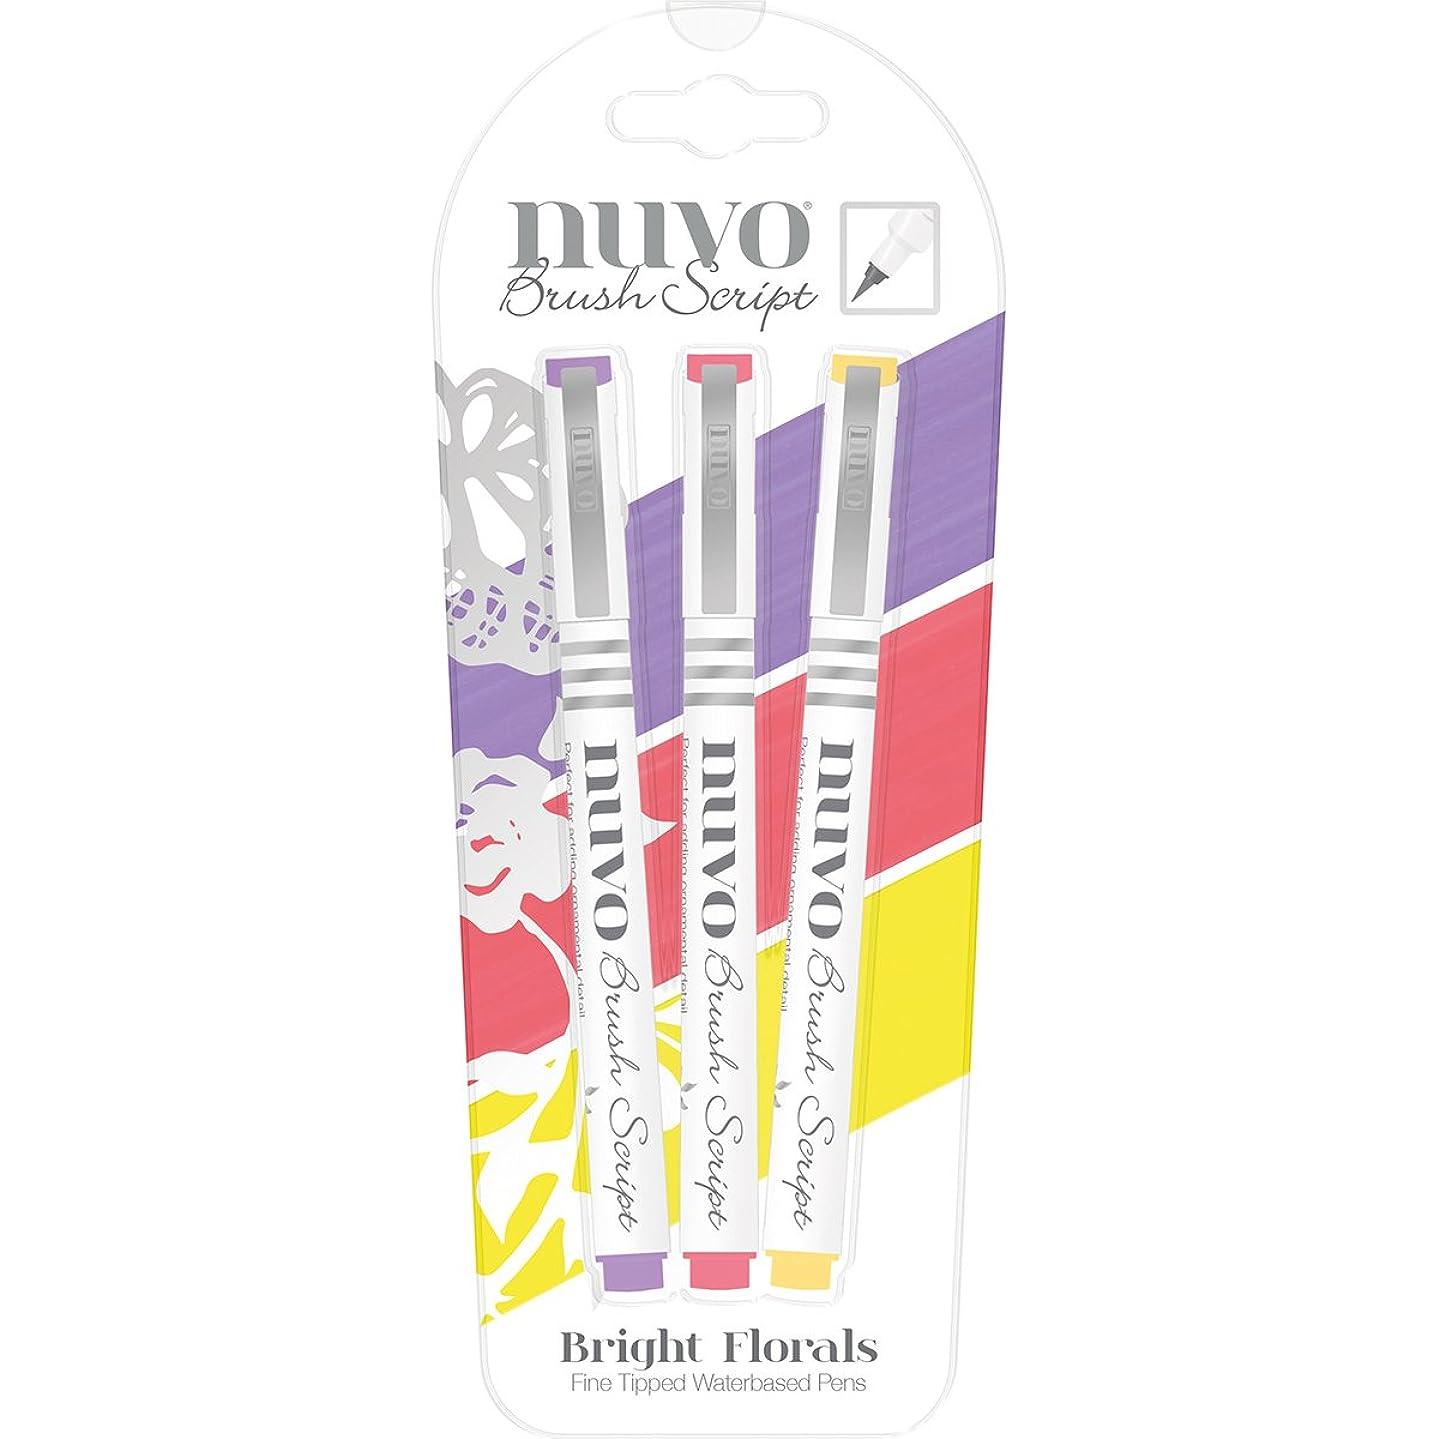 No Tools Rain Saving Device Tonic Studios Nuvo Brush Script Pens, Multicolored, 21.59 x 8.89 x 0.96 cm